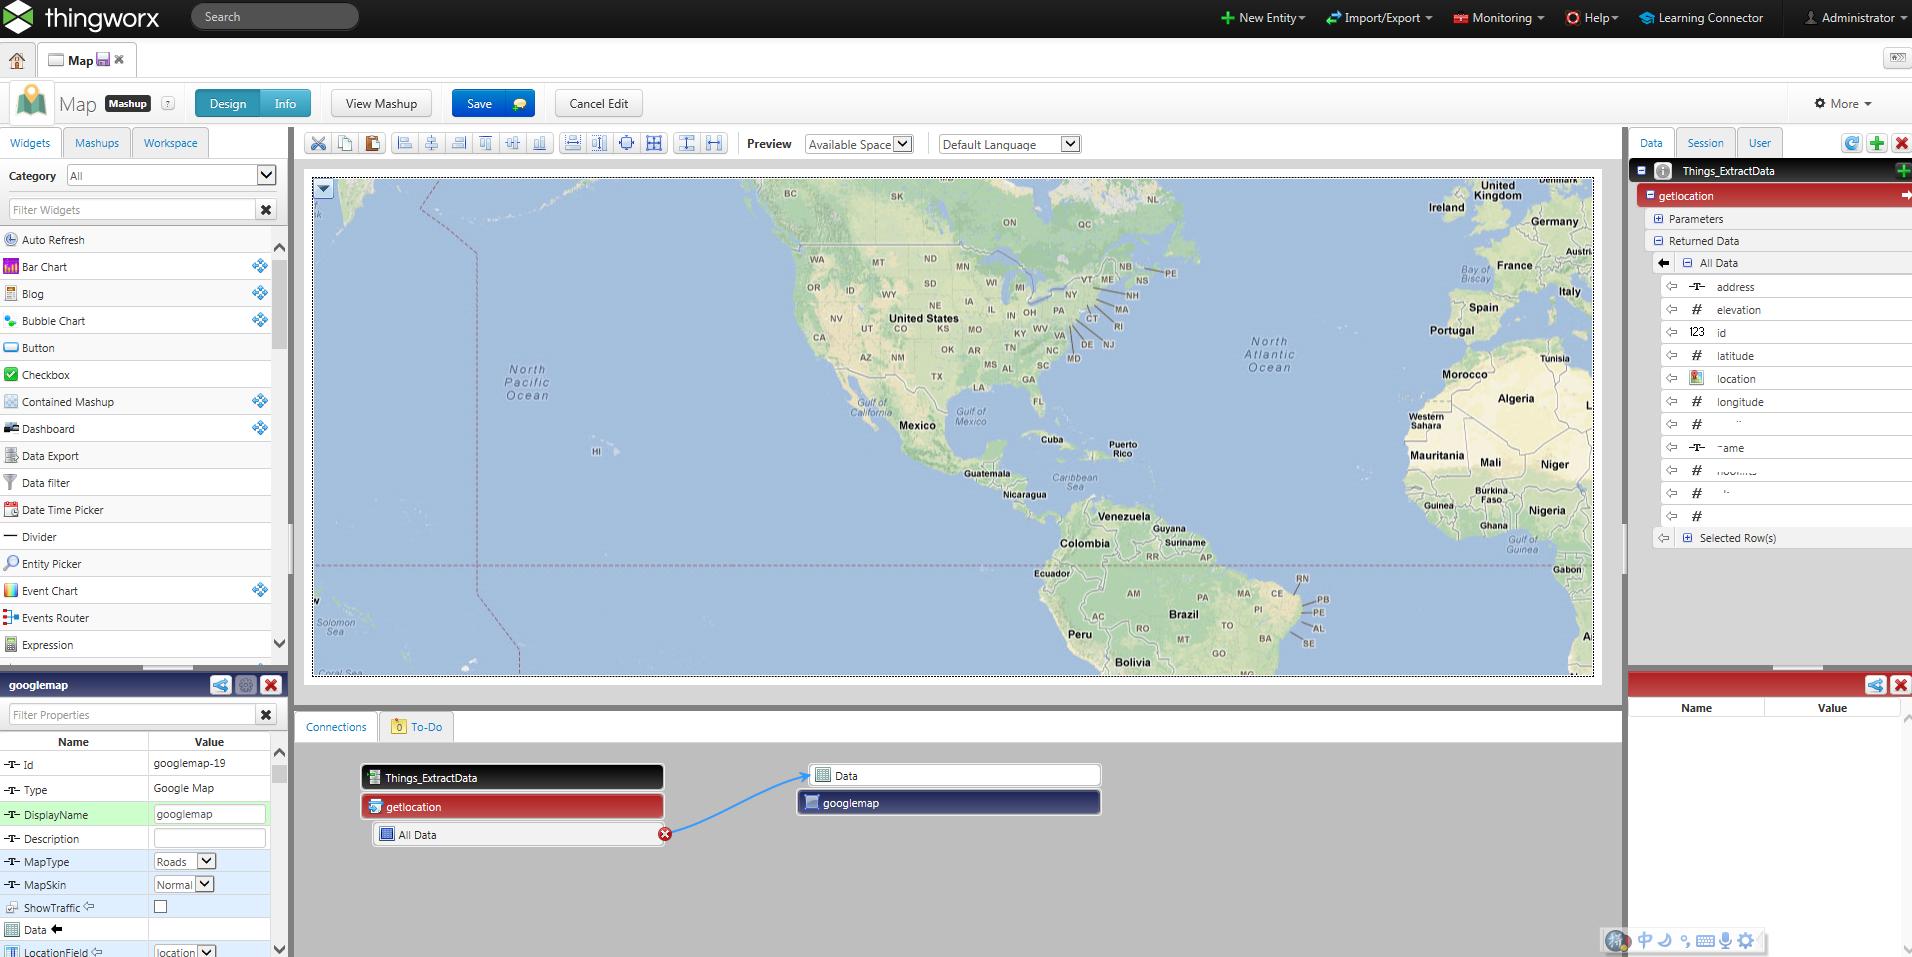 Google Map Problem - PTC Community